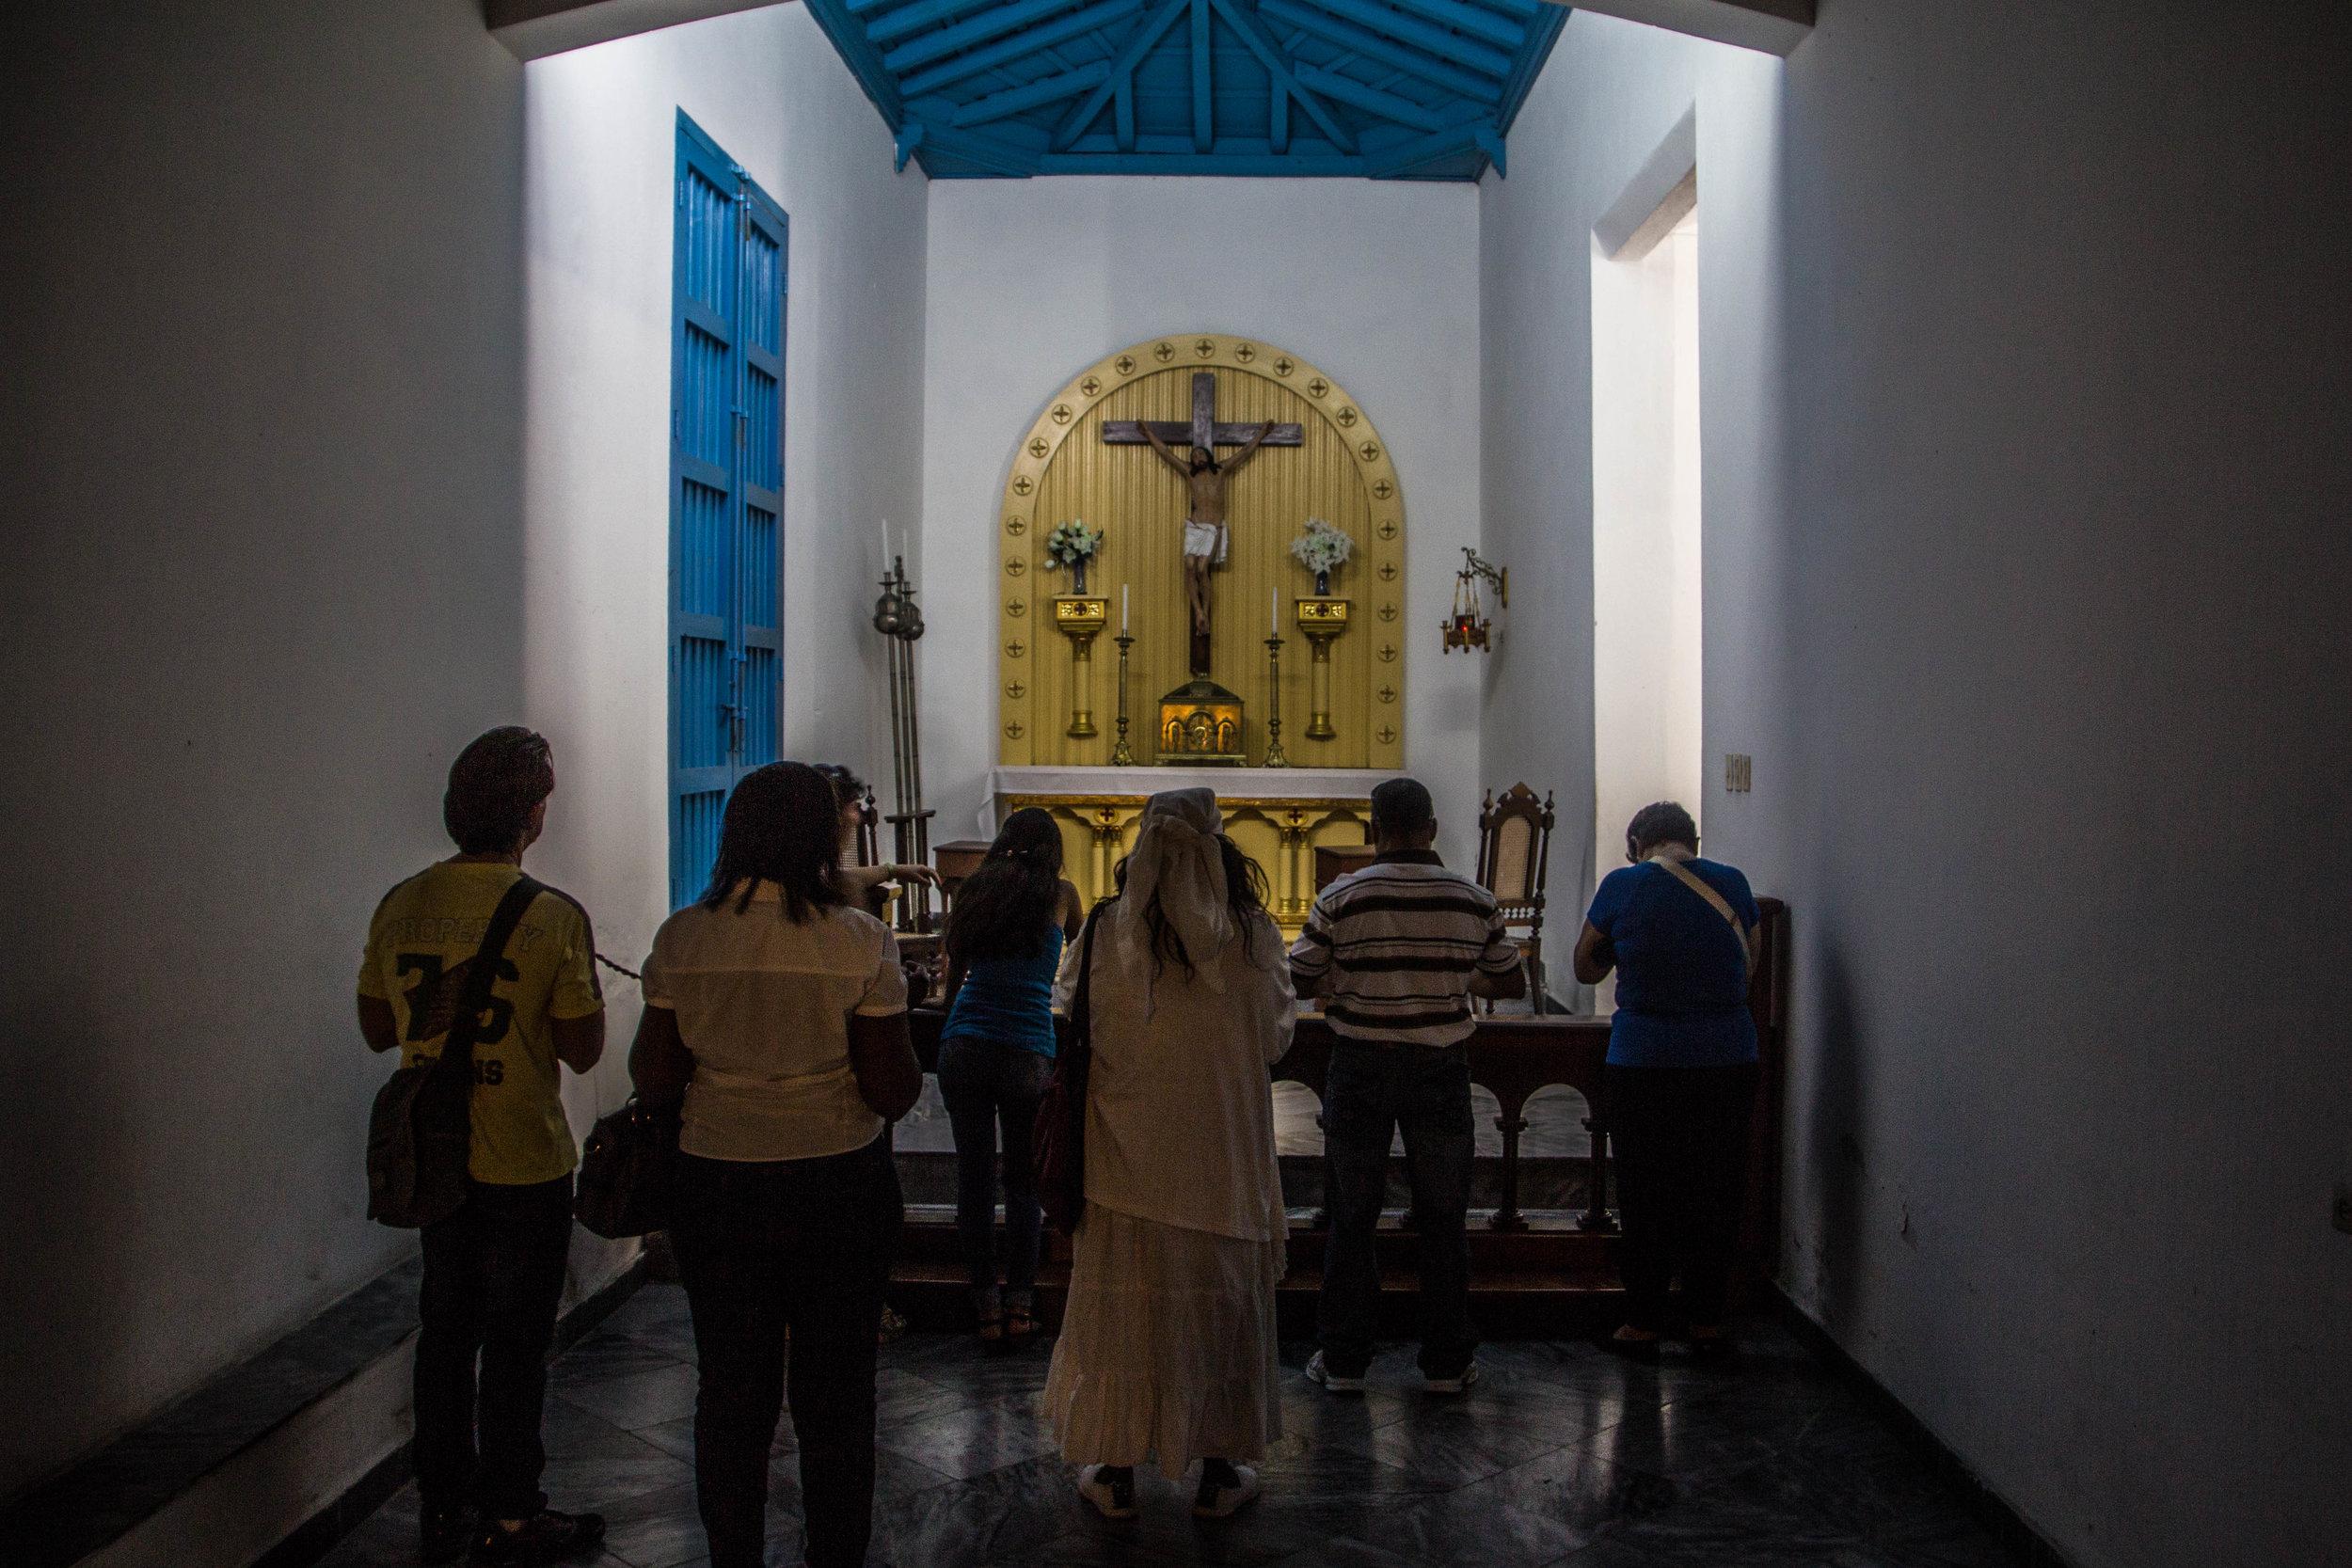 iglesia de nuestra señora de regla havana cuba santeria-1-10.jpg